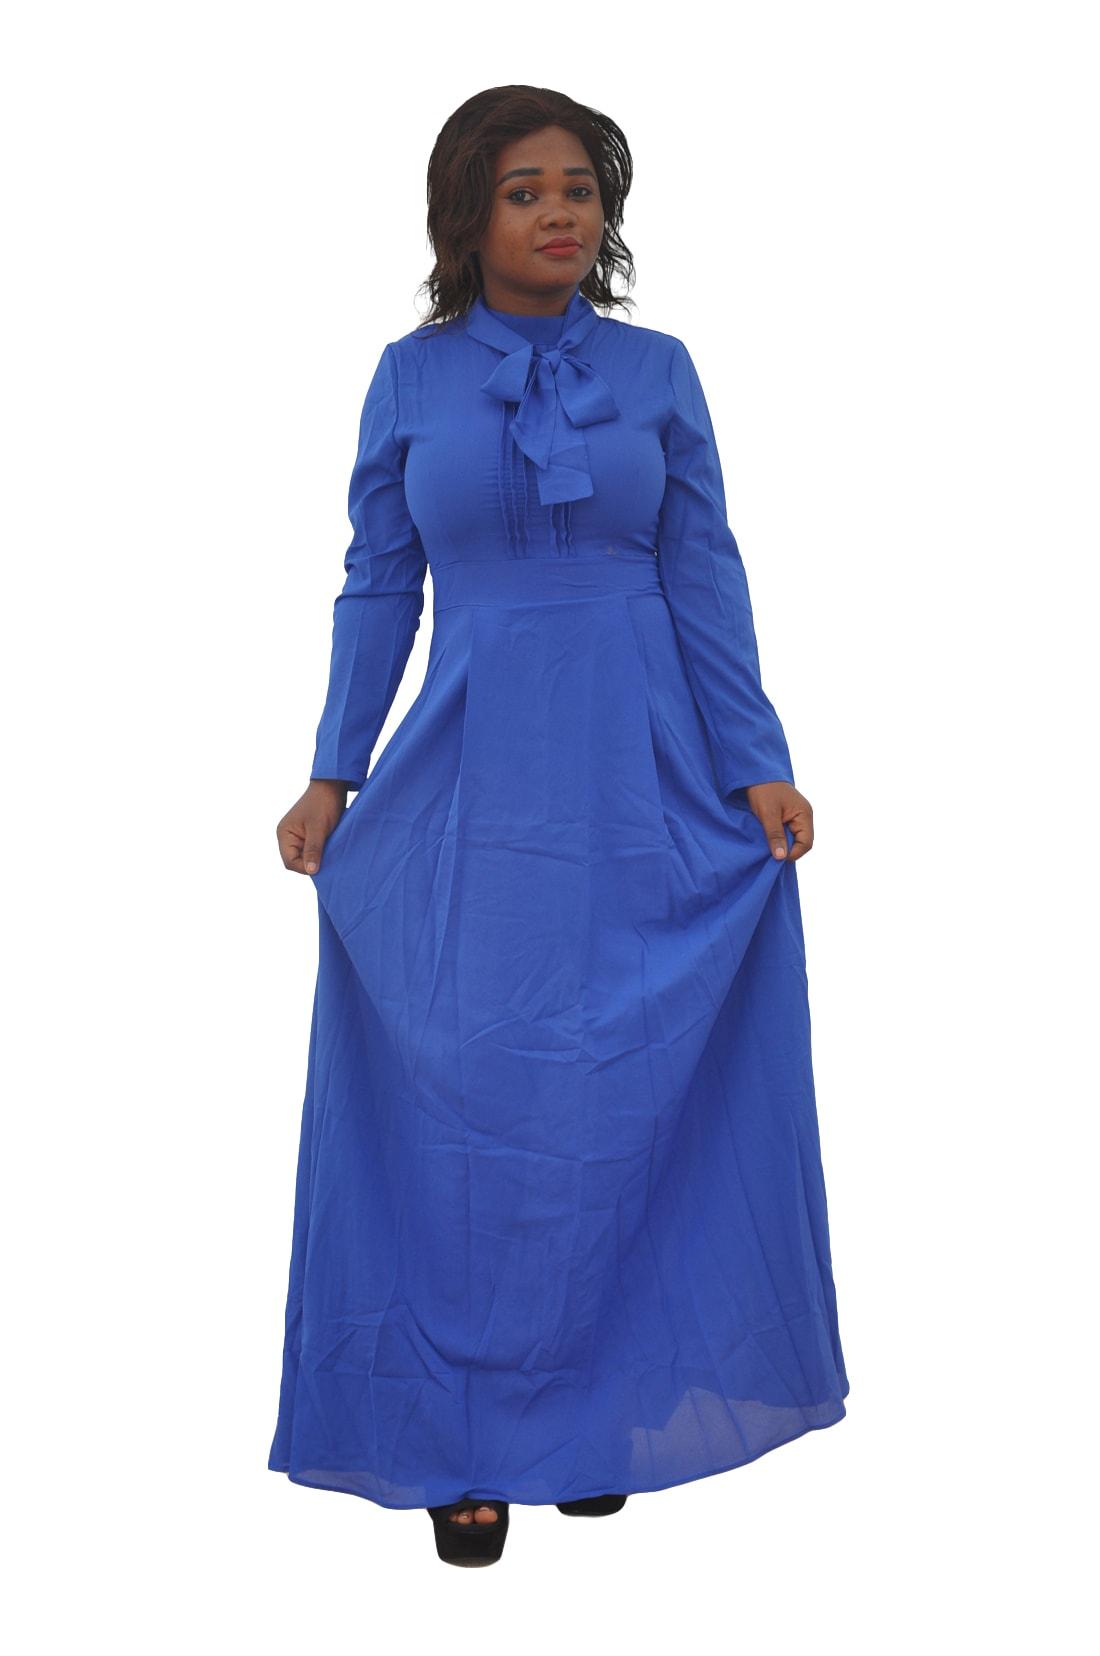 M0293 blue6 Long Sleeve Dresses maureens.com boutique